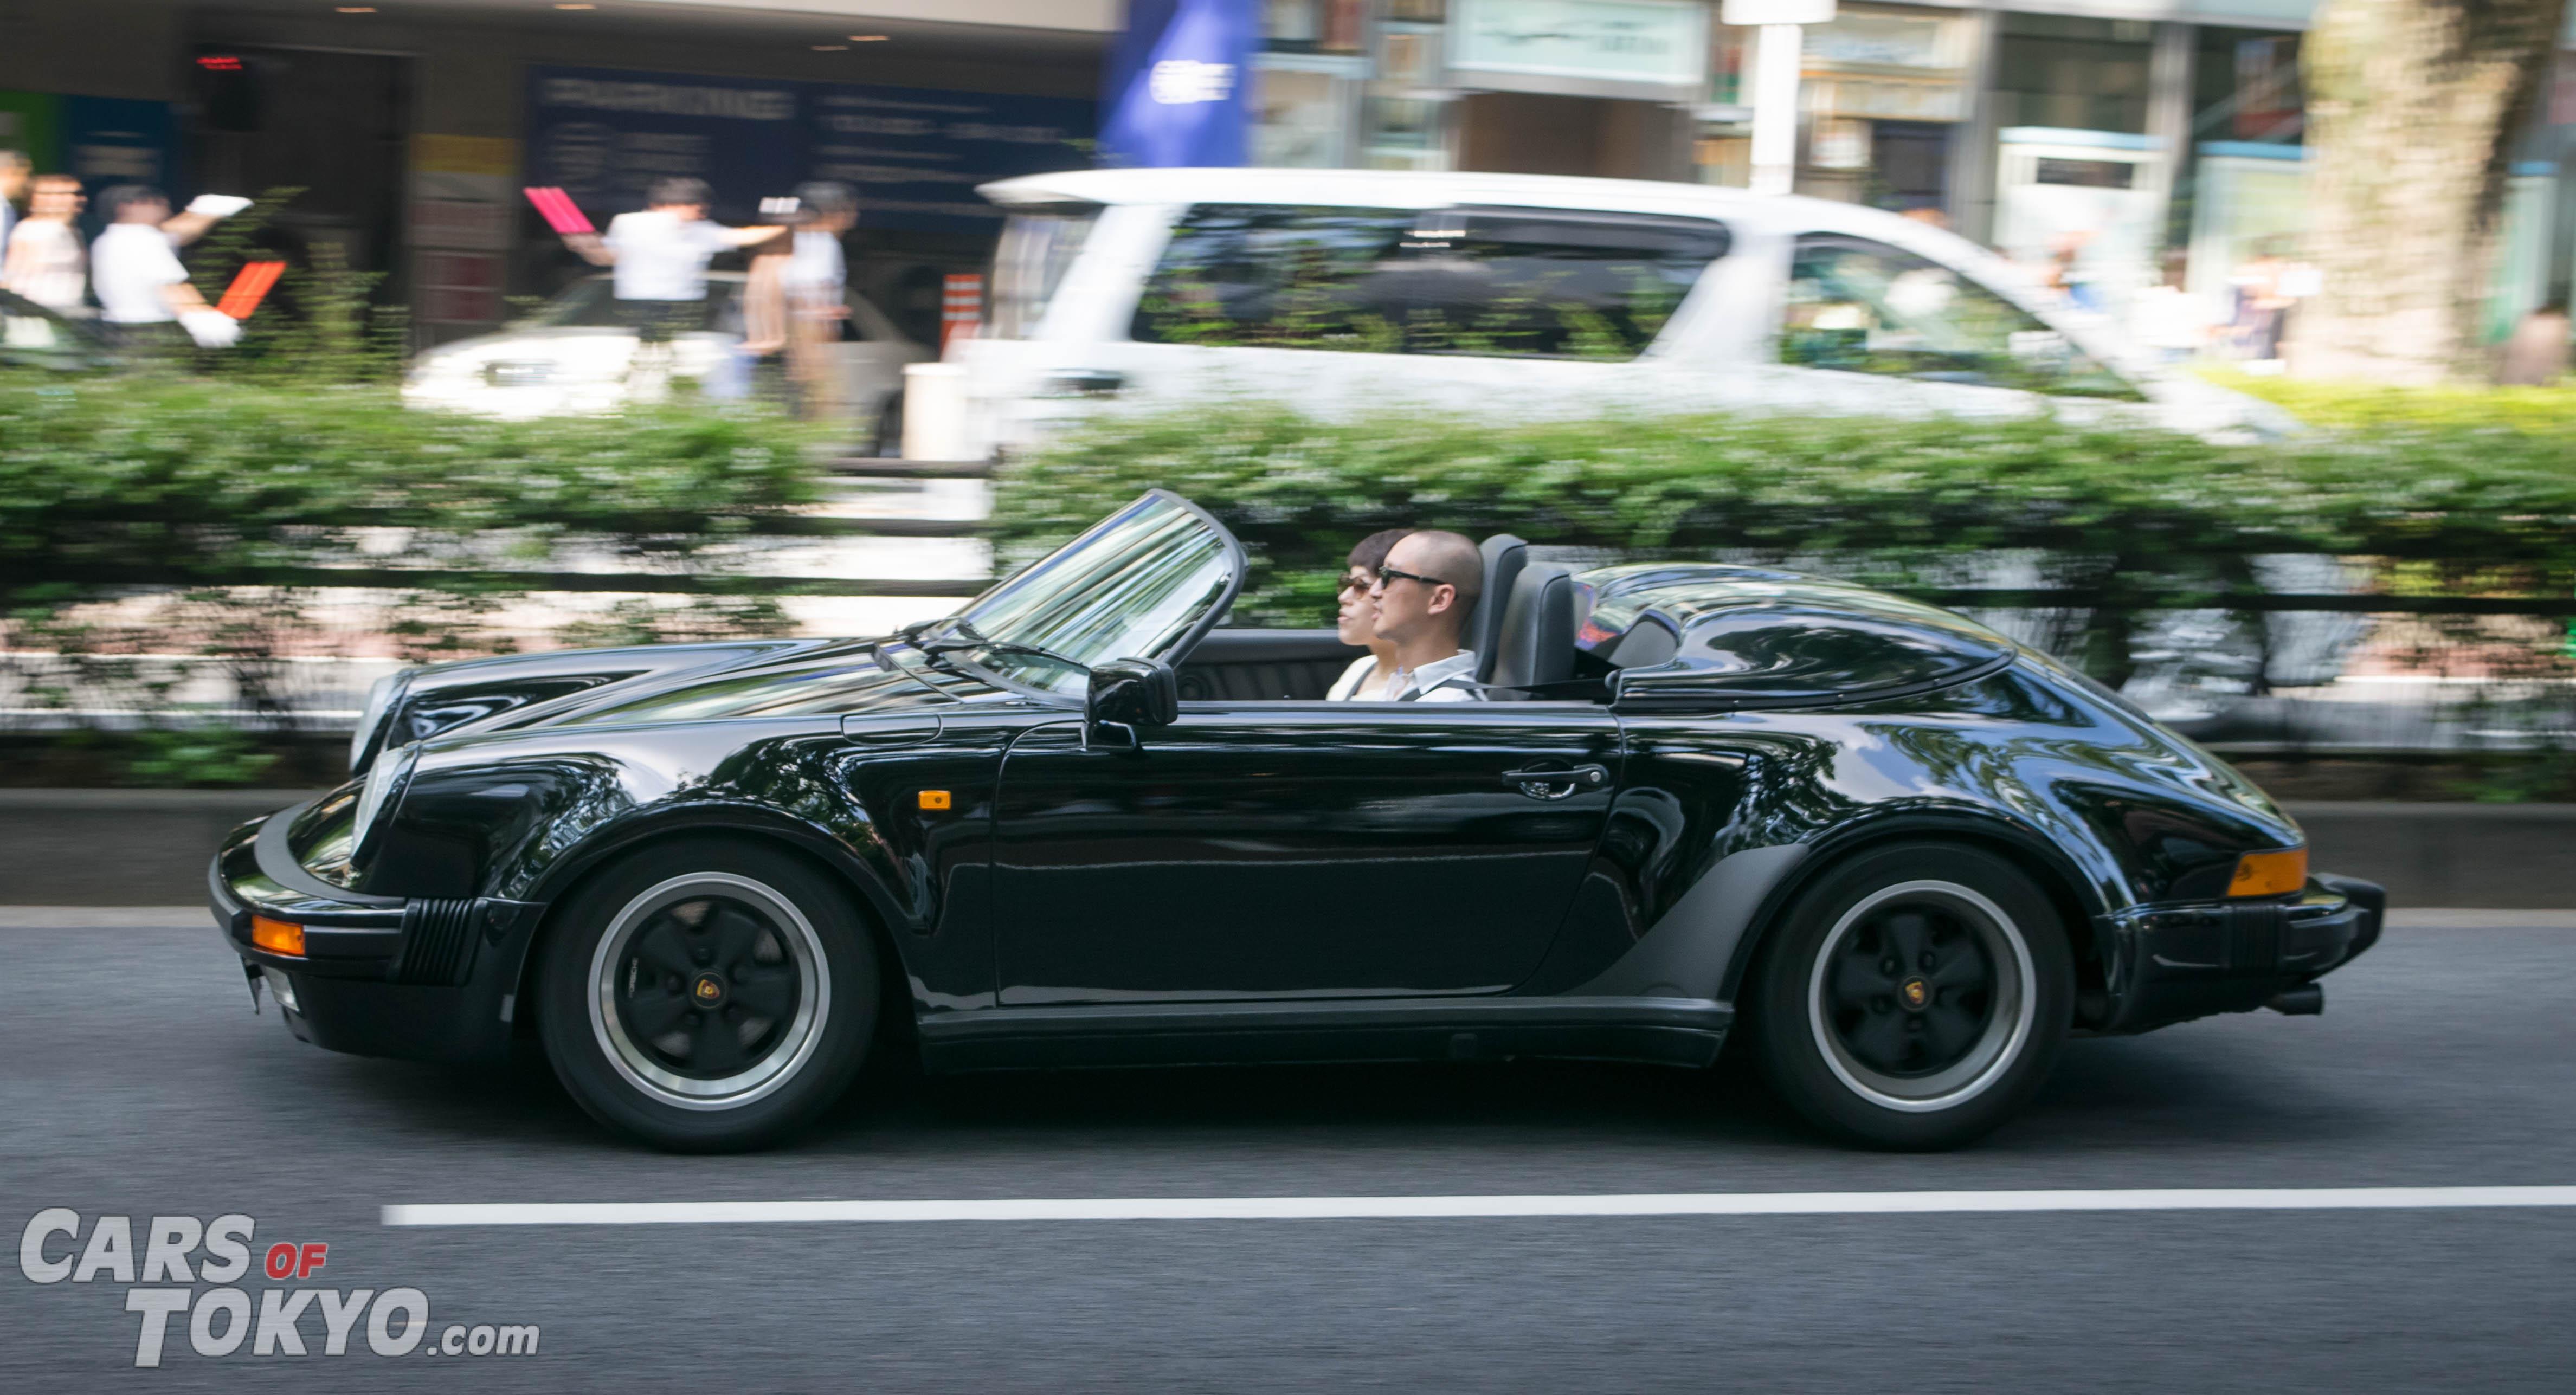 Cars of Tokyo Classic Porsche 930 Speedster